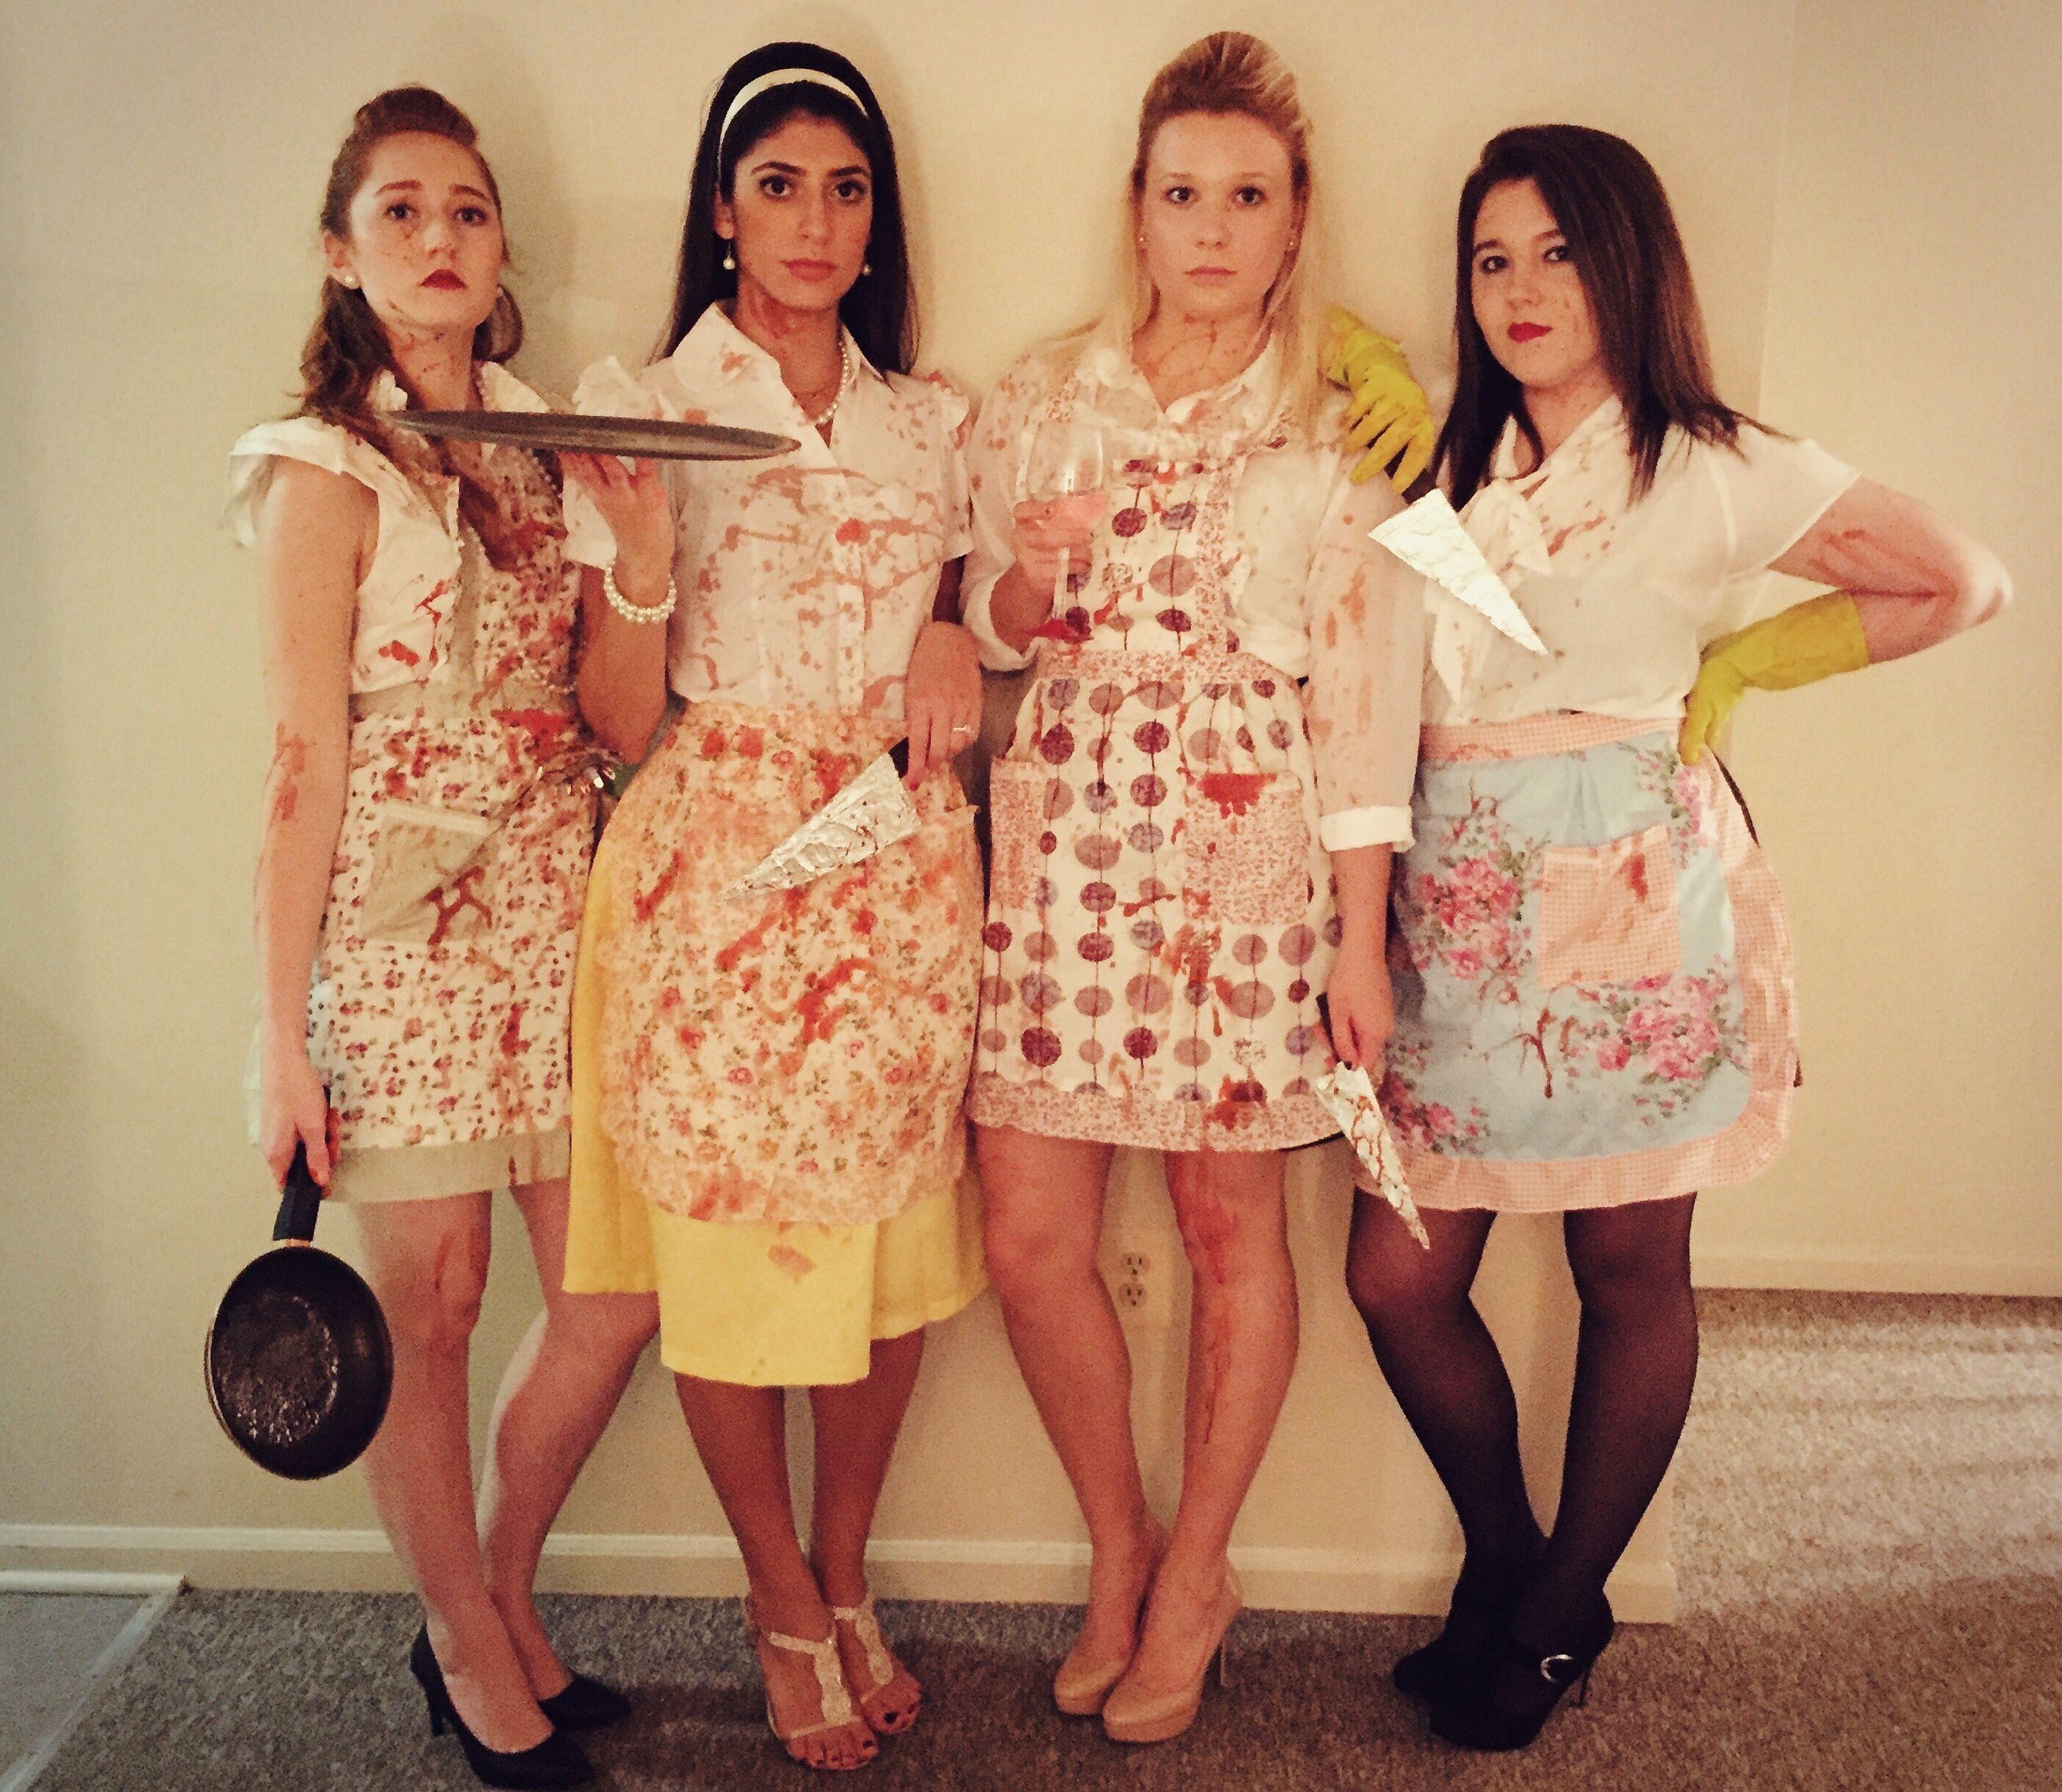 68b1853ee4278 Halloween Costume, DIY Murderous Housewives, College Costumes, Killer  wives, housewife, girl group costume, cheap Halloween costume, Murderous  Housewives ...